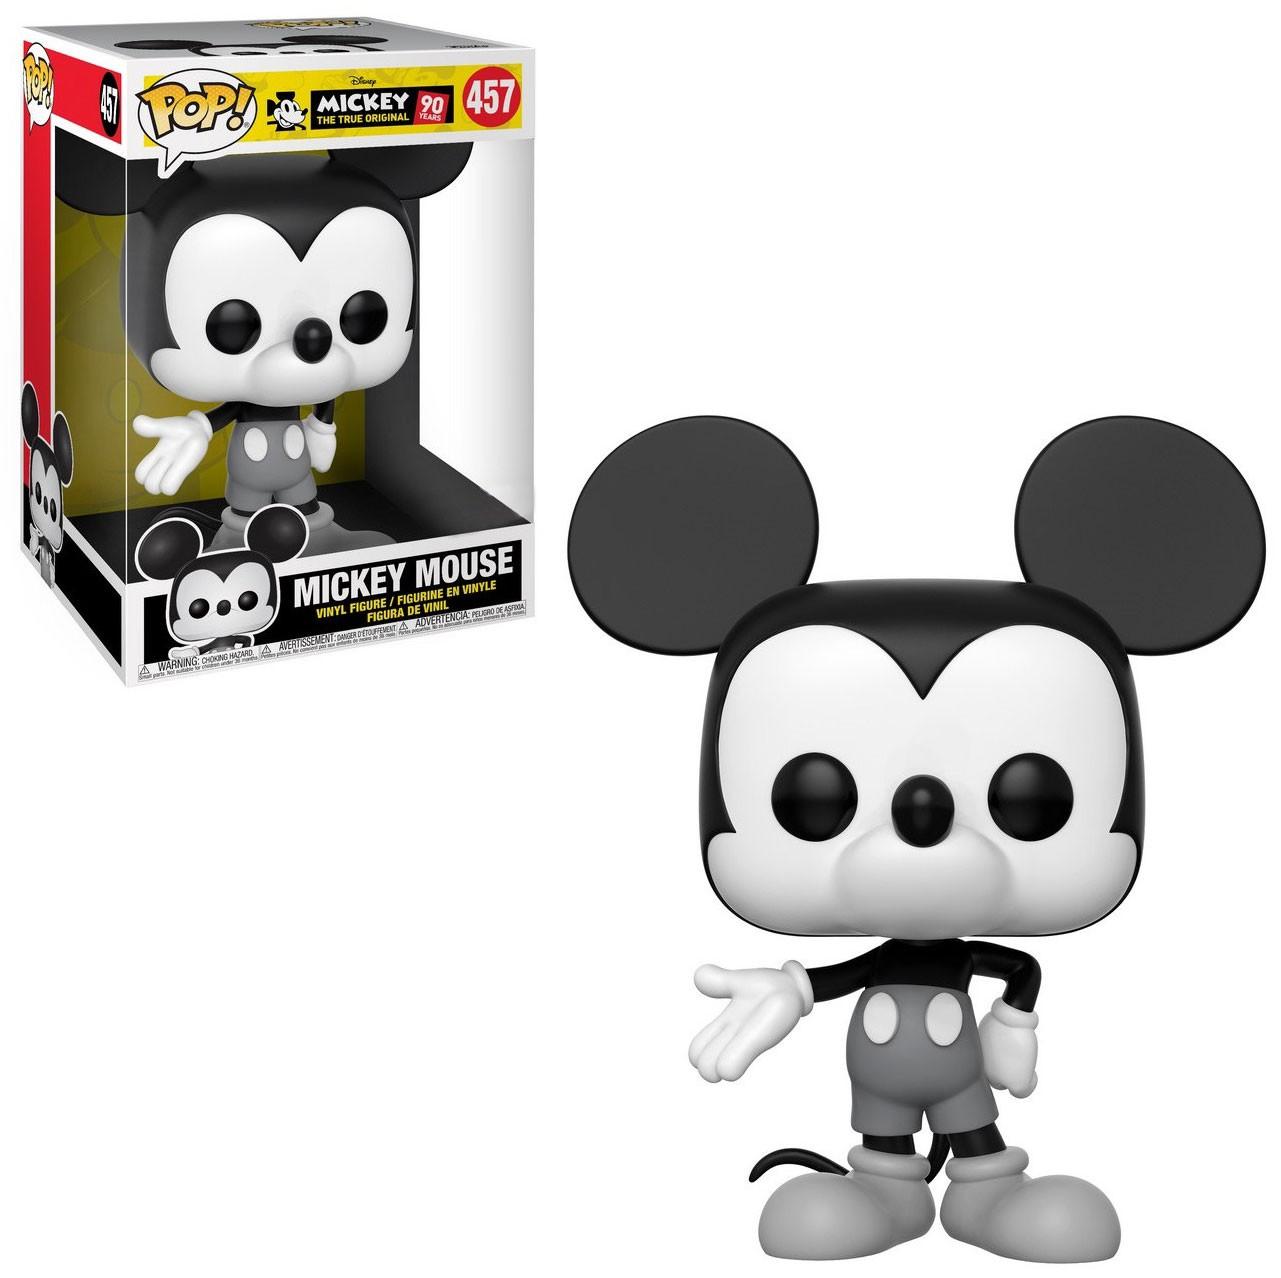 Funko POP! Disney Mickey Mouse Vinyl Figure